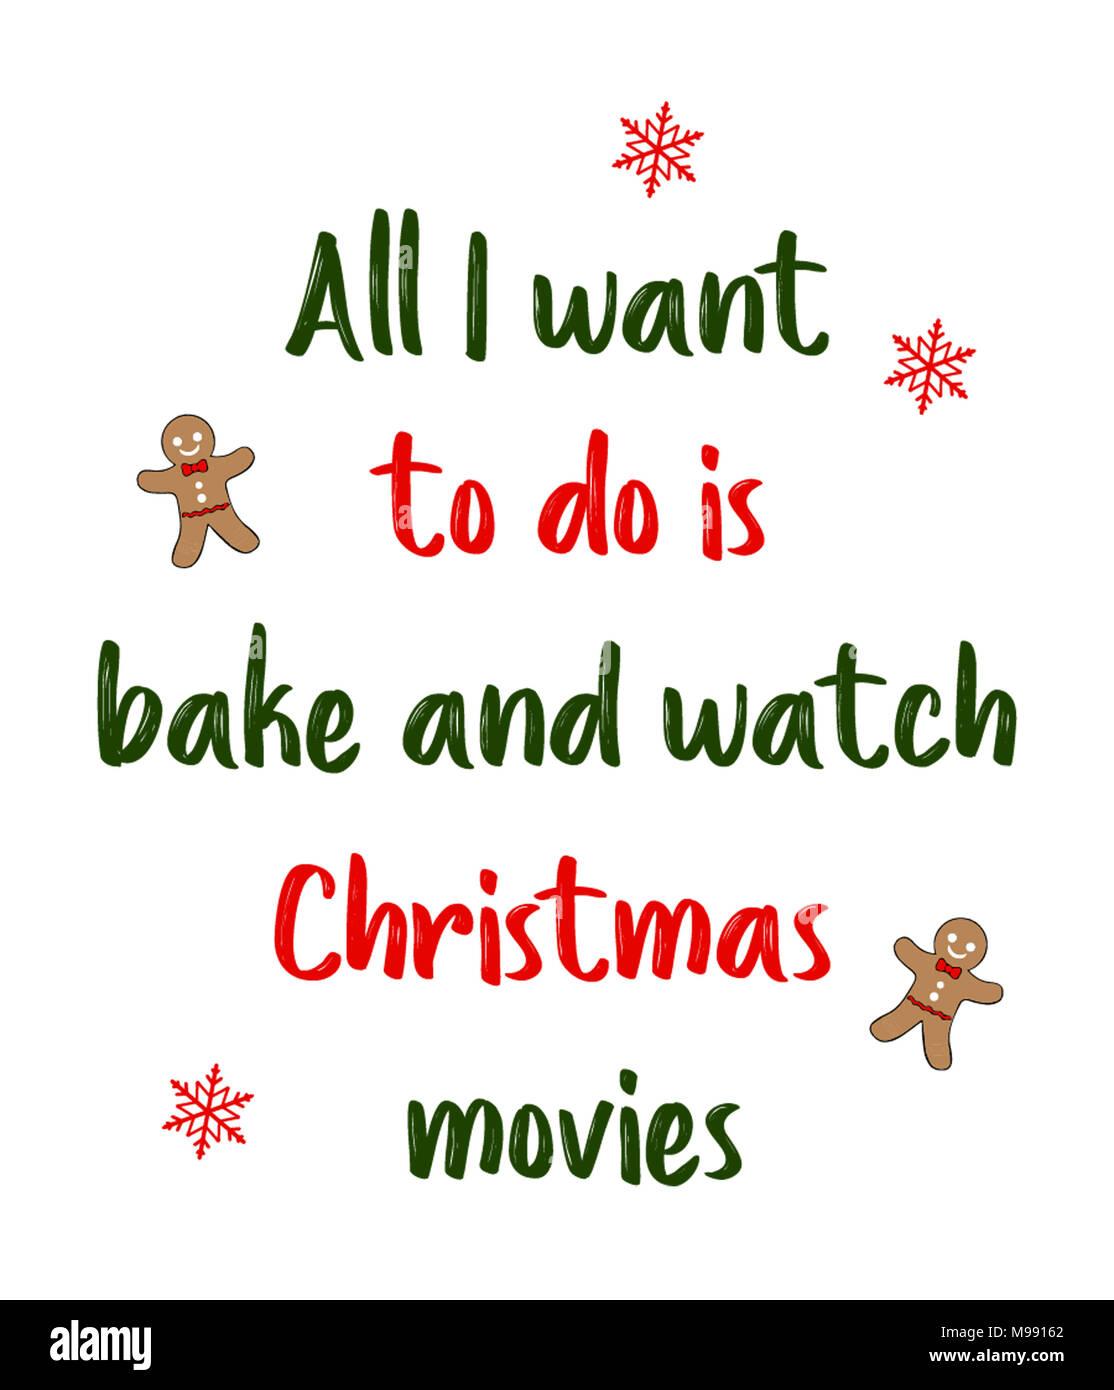 Christmas Baking Quotes : christmas, baking, quotes, Watch, Christmas, Movies, Stock, Photo, Alamy